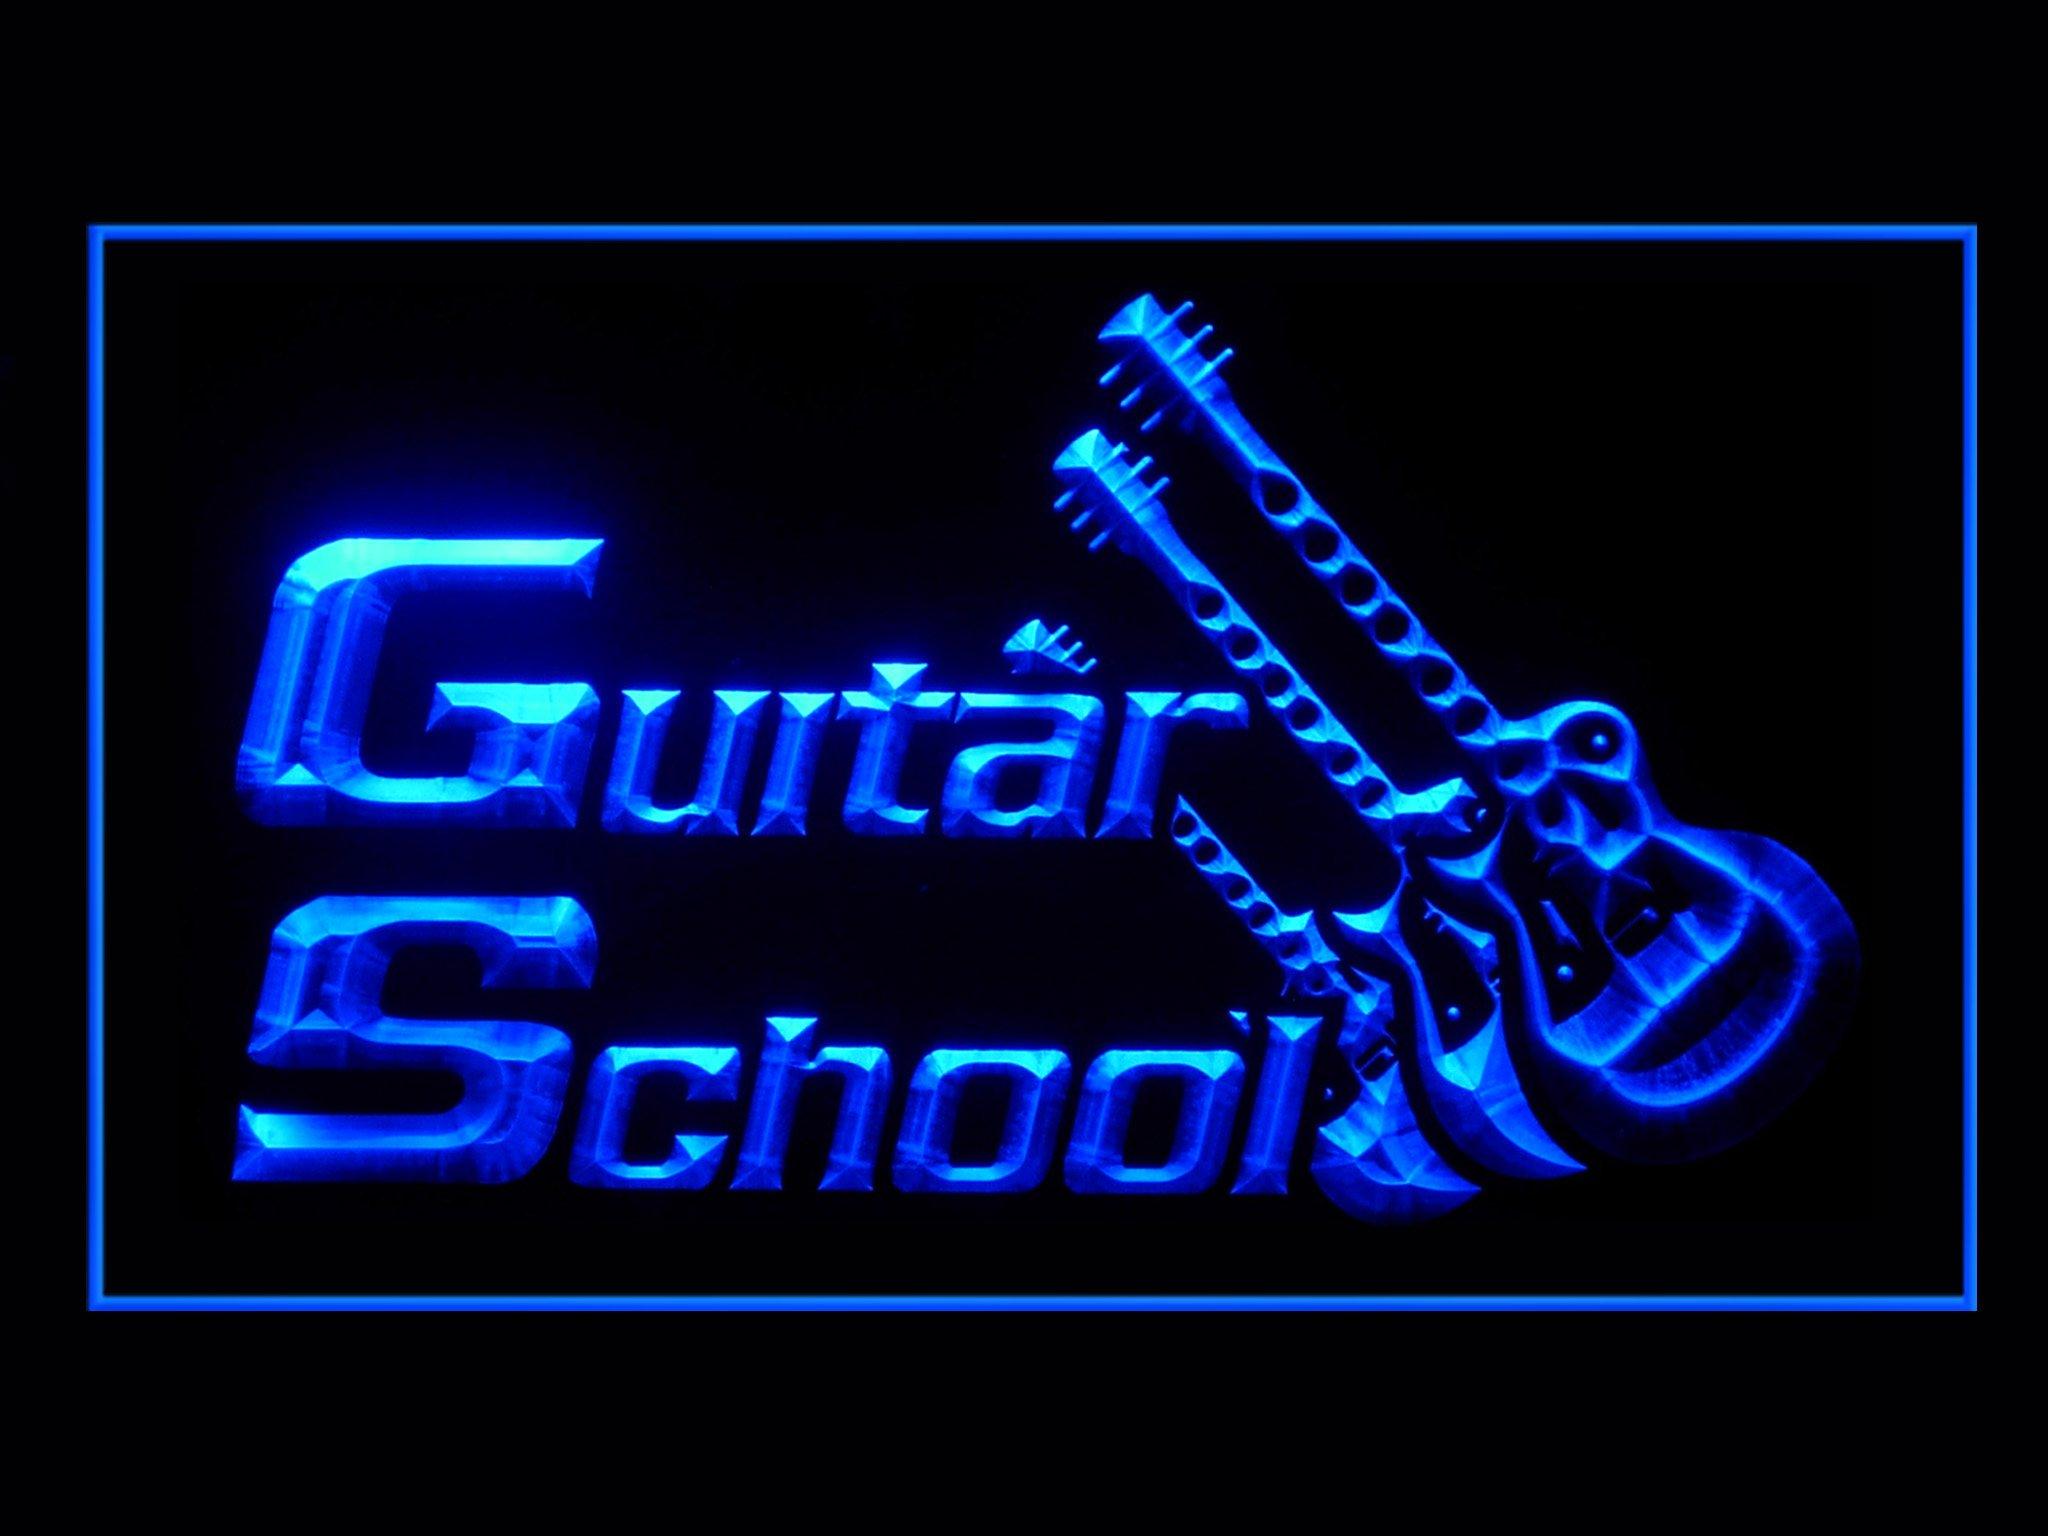 Guitar School Lesson Shop Led Light Sign